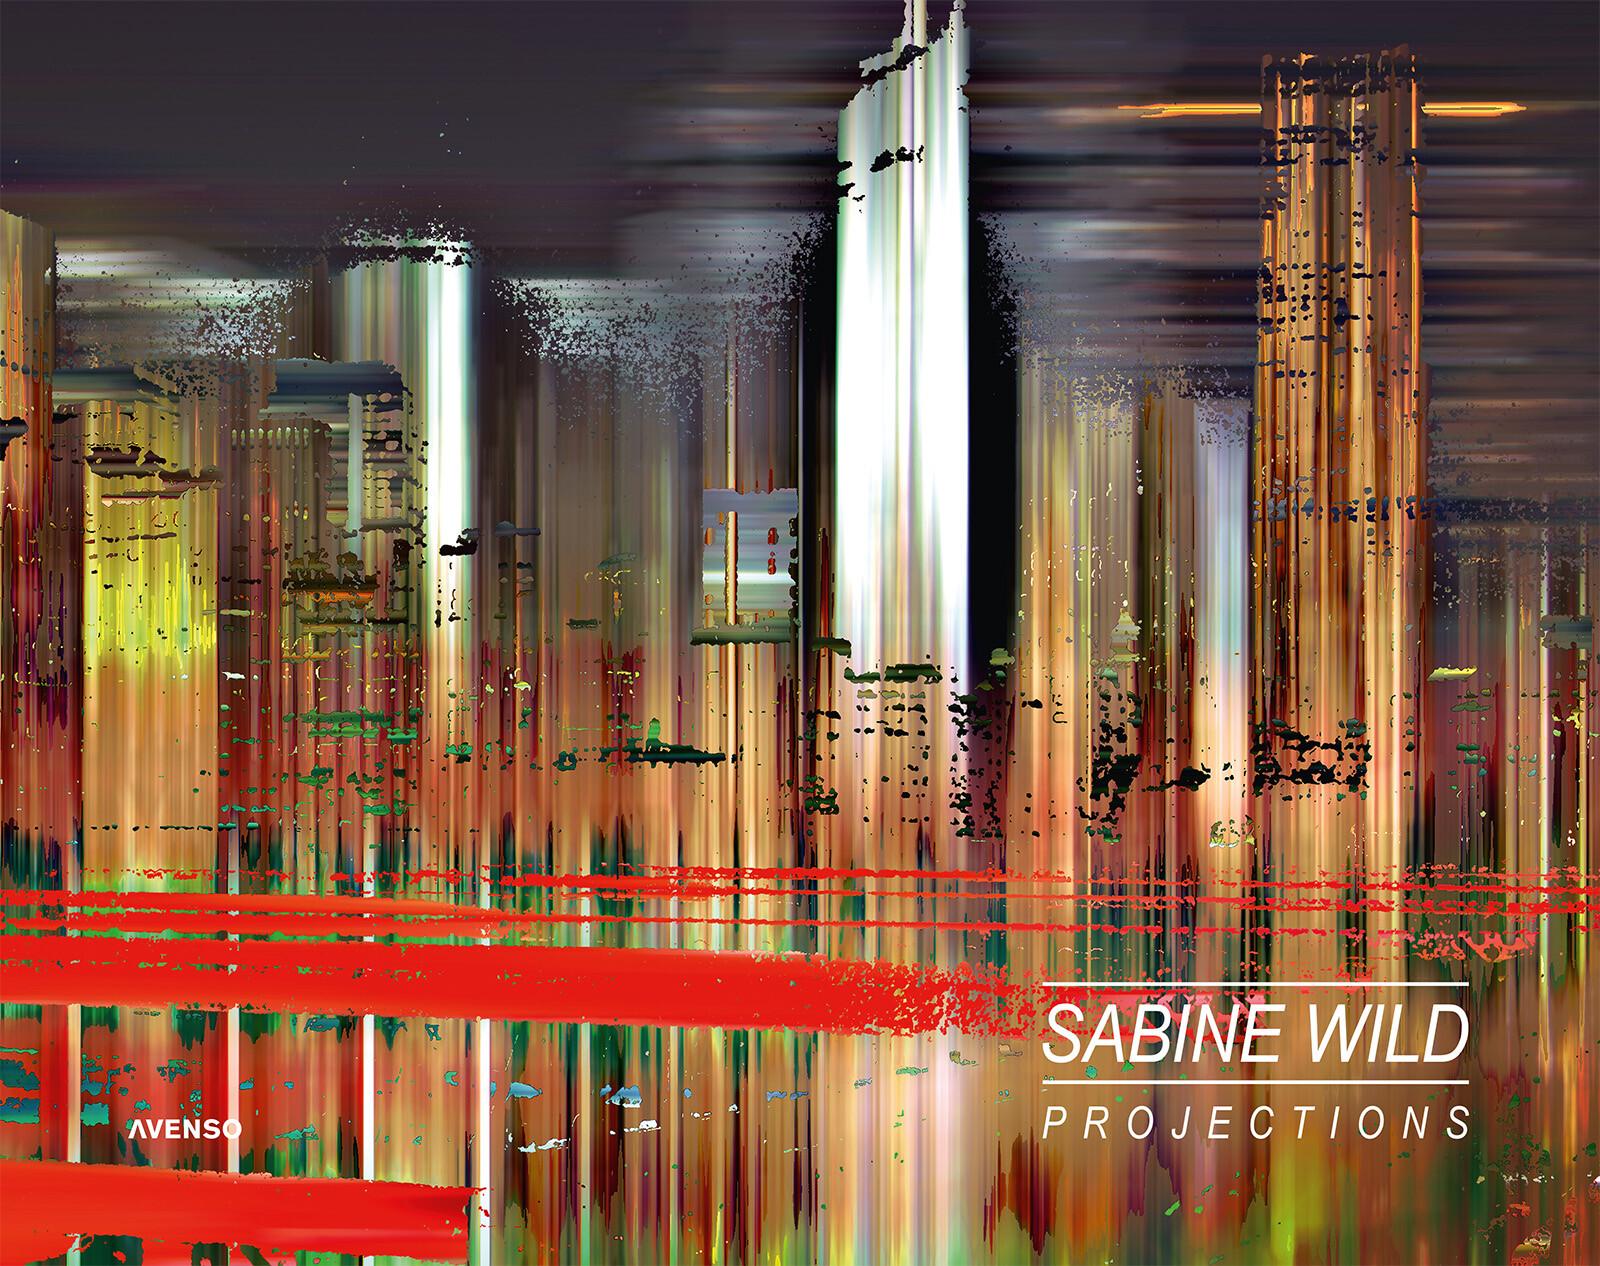 ARTIST BOOK - Projections - Sabine Wild